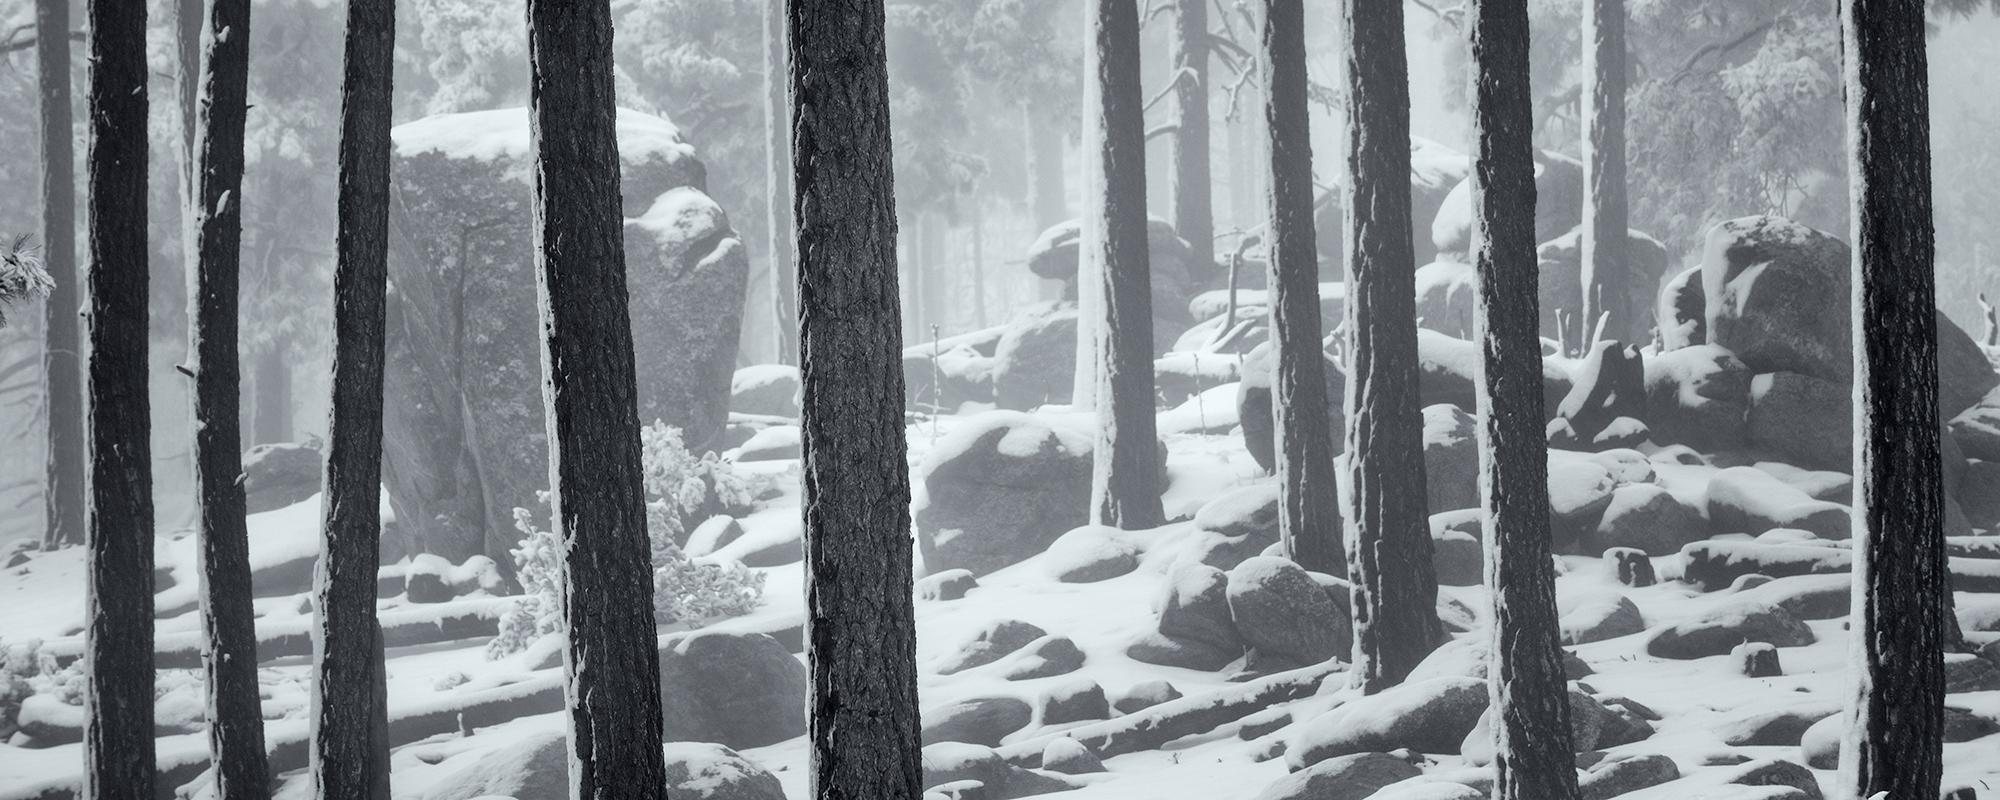 Trees in Fog. Mt Lemmon, Arizona, 2017